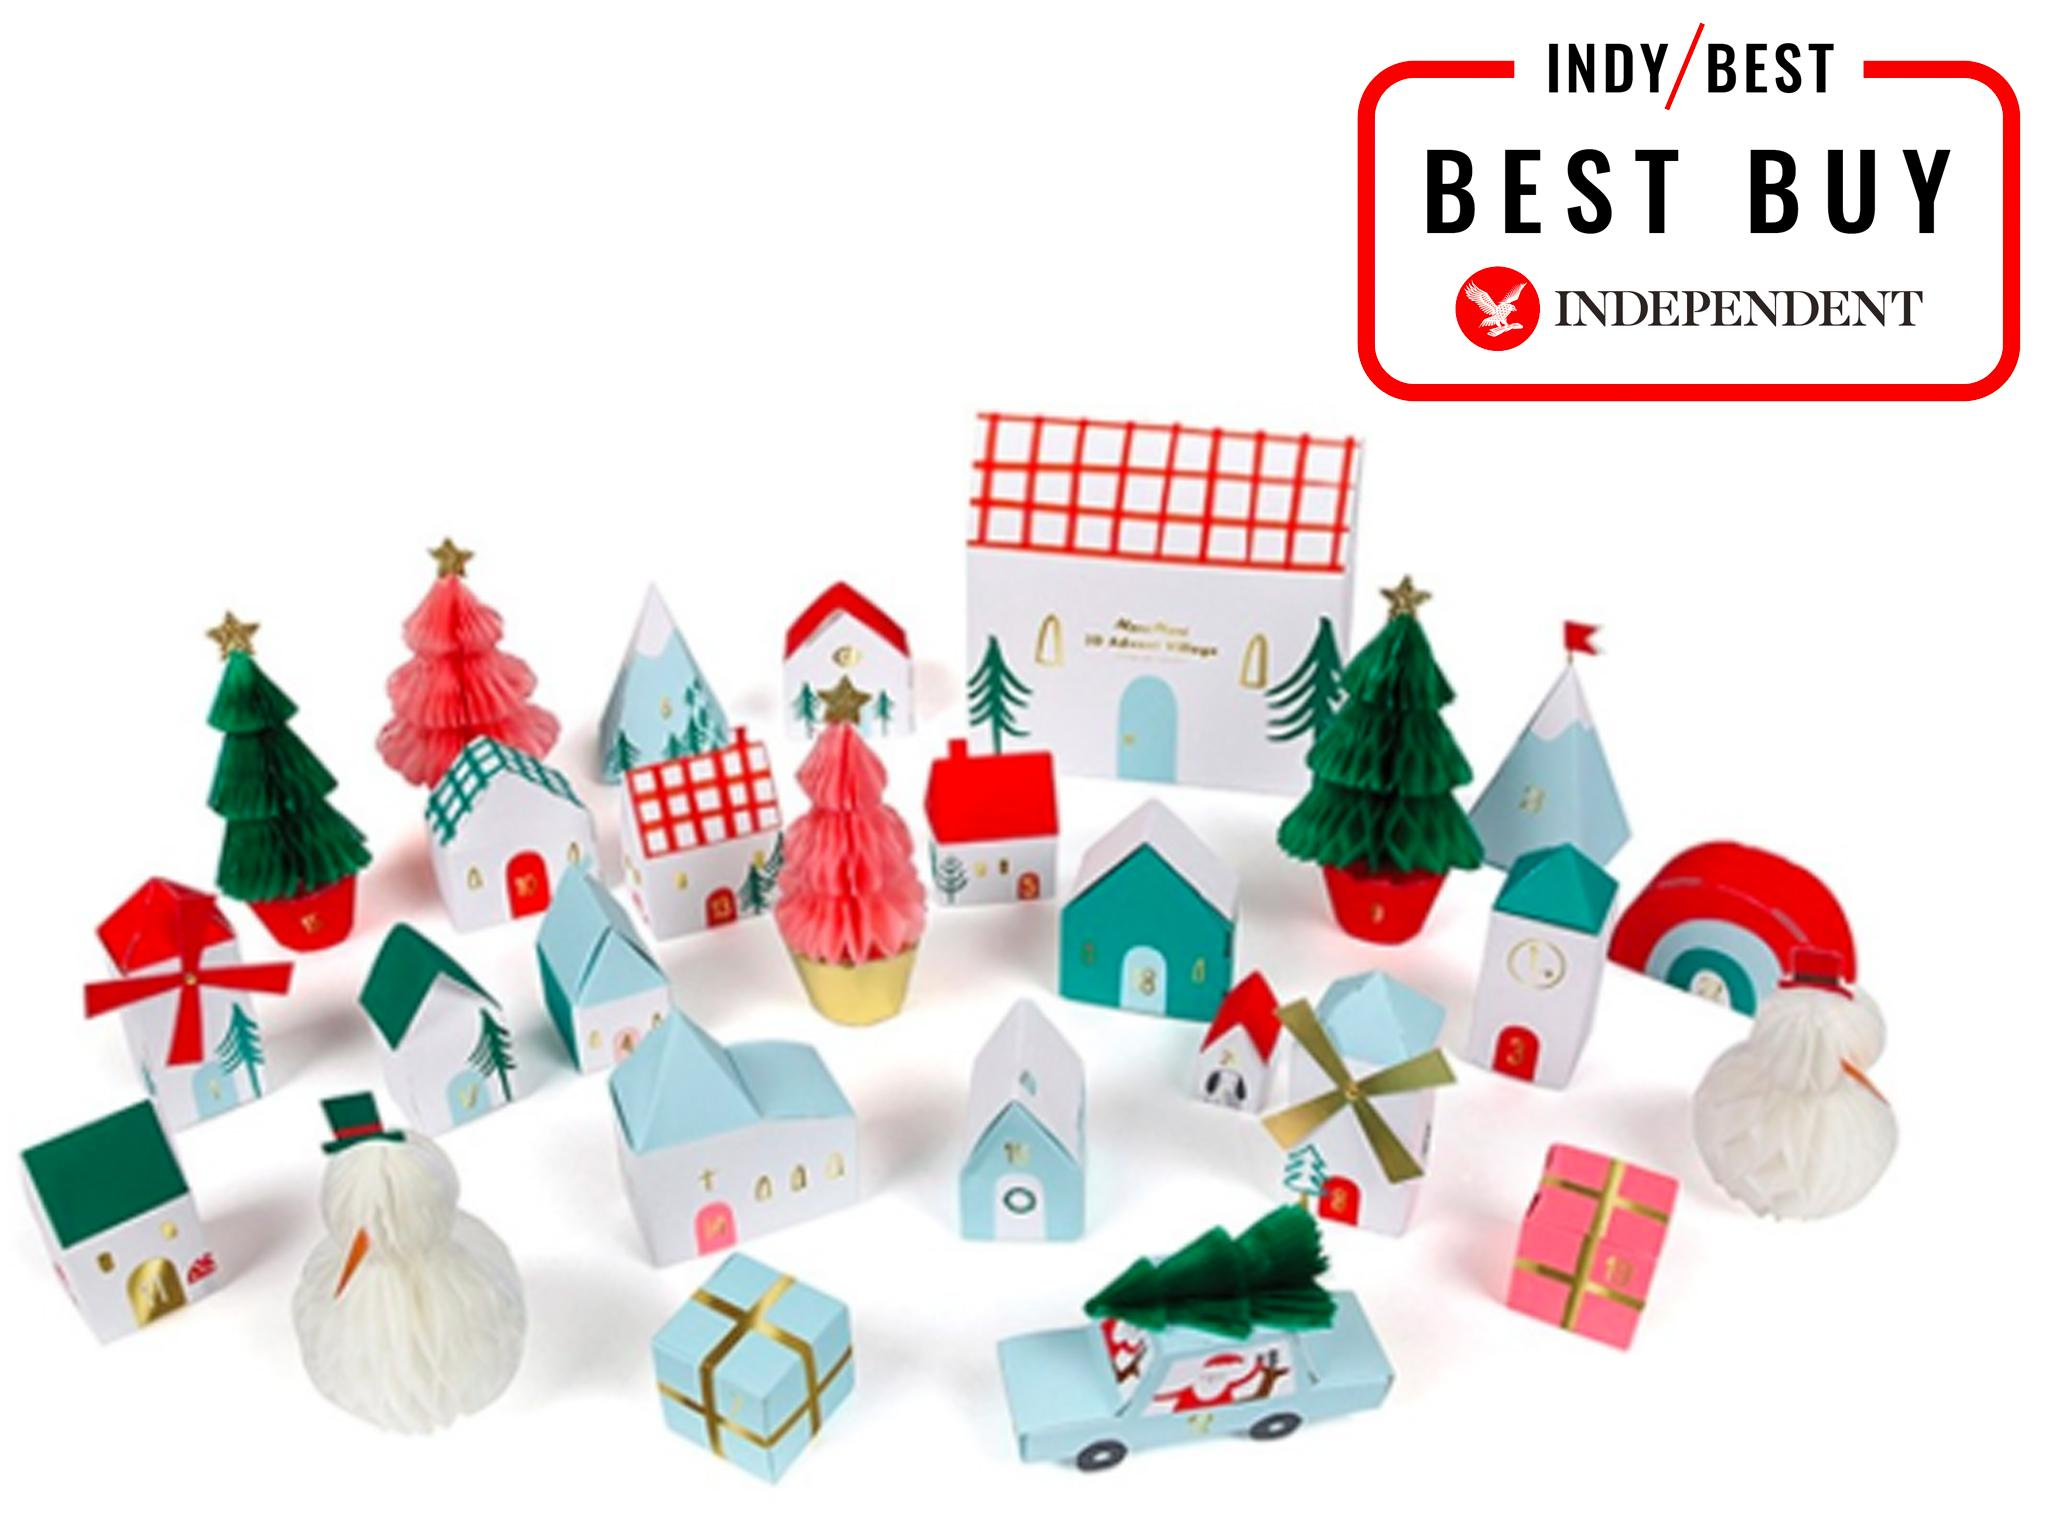 10 best DIY advent calendars | The Independent